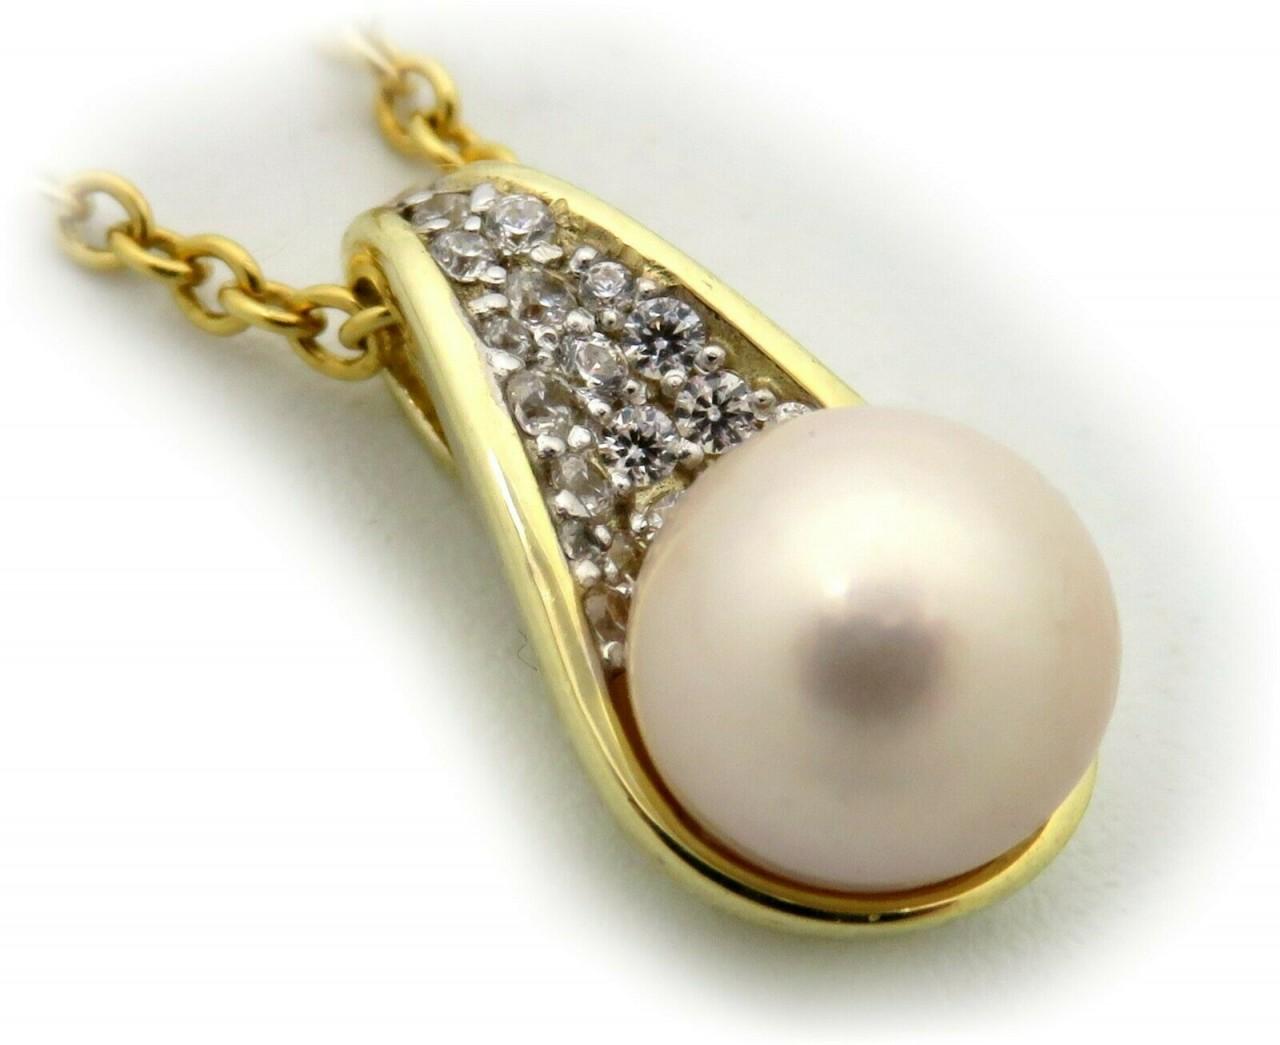 Neu Anhänger Tropfen Zirkonia echt Gold 333 Gelbgold 8 karat Perle 8 mm Qualität